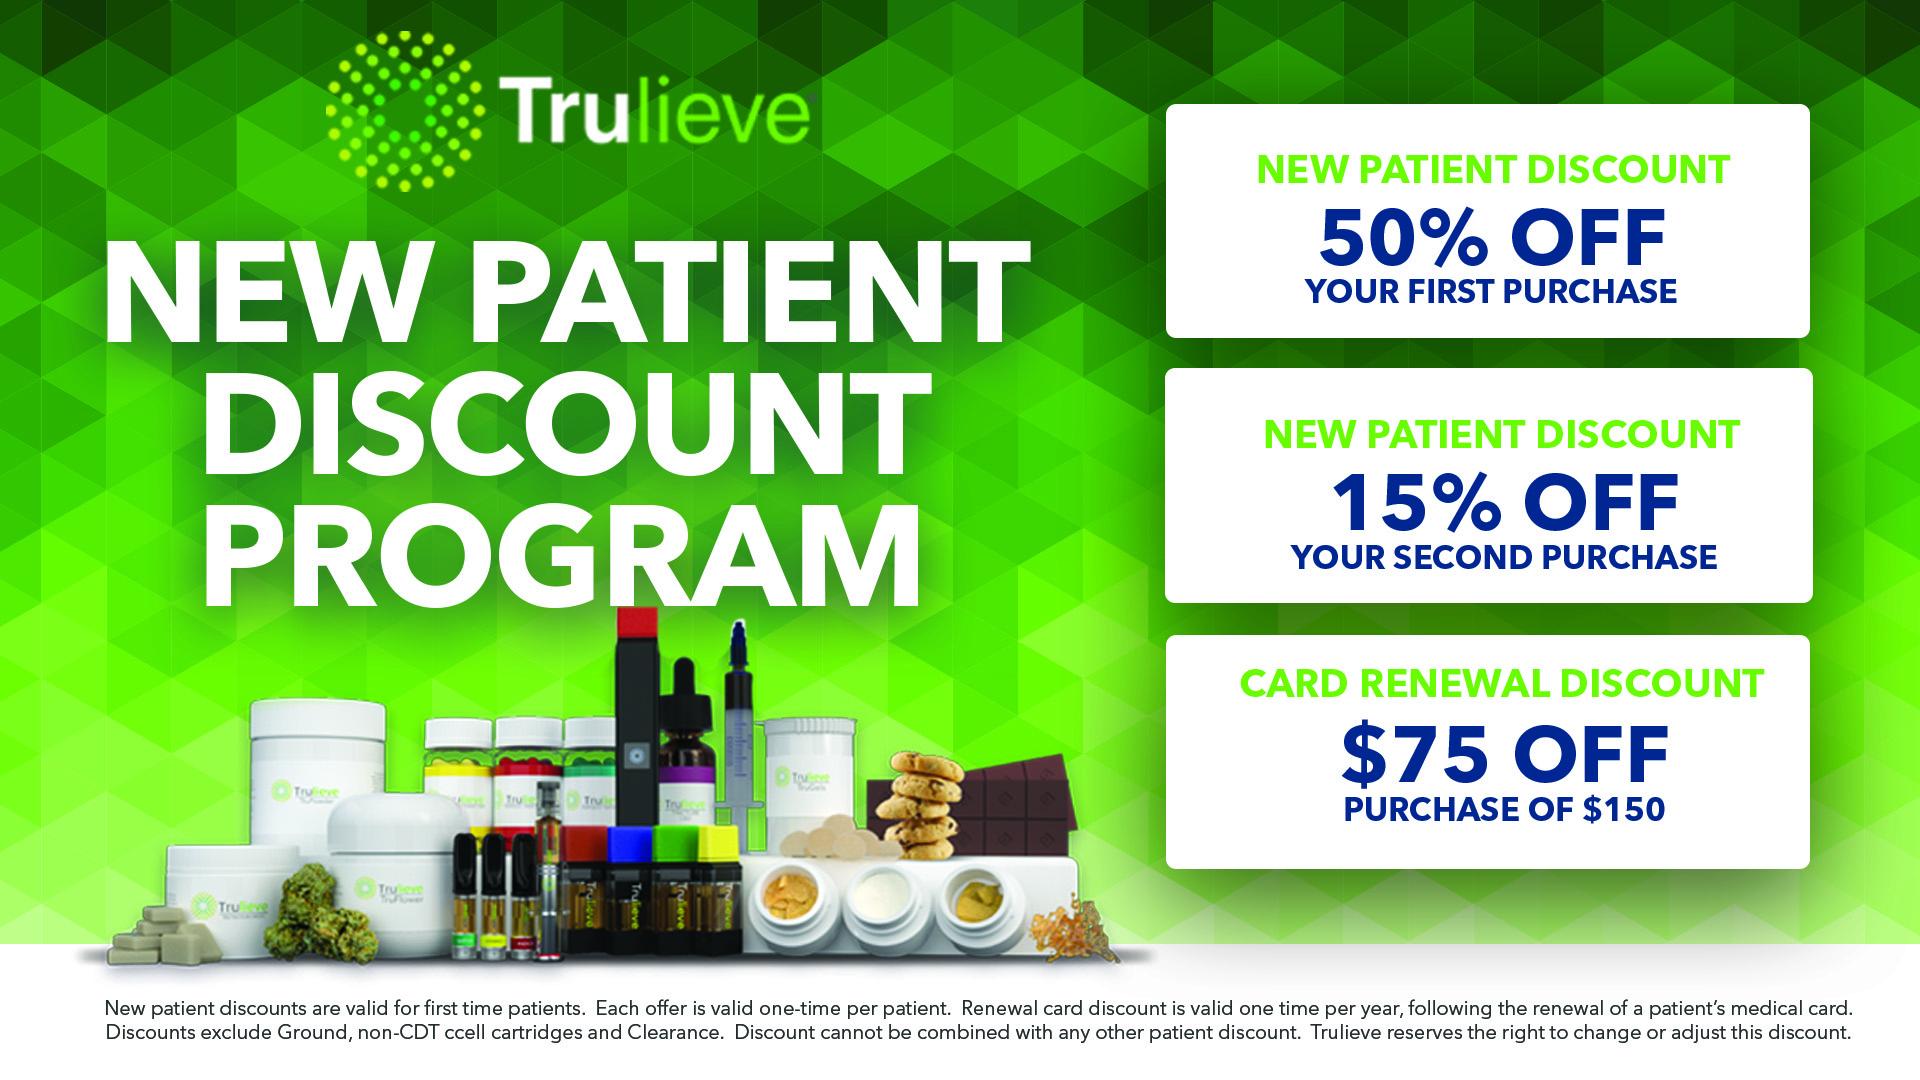 August 2021 New Patient Discount